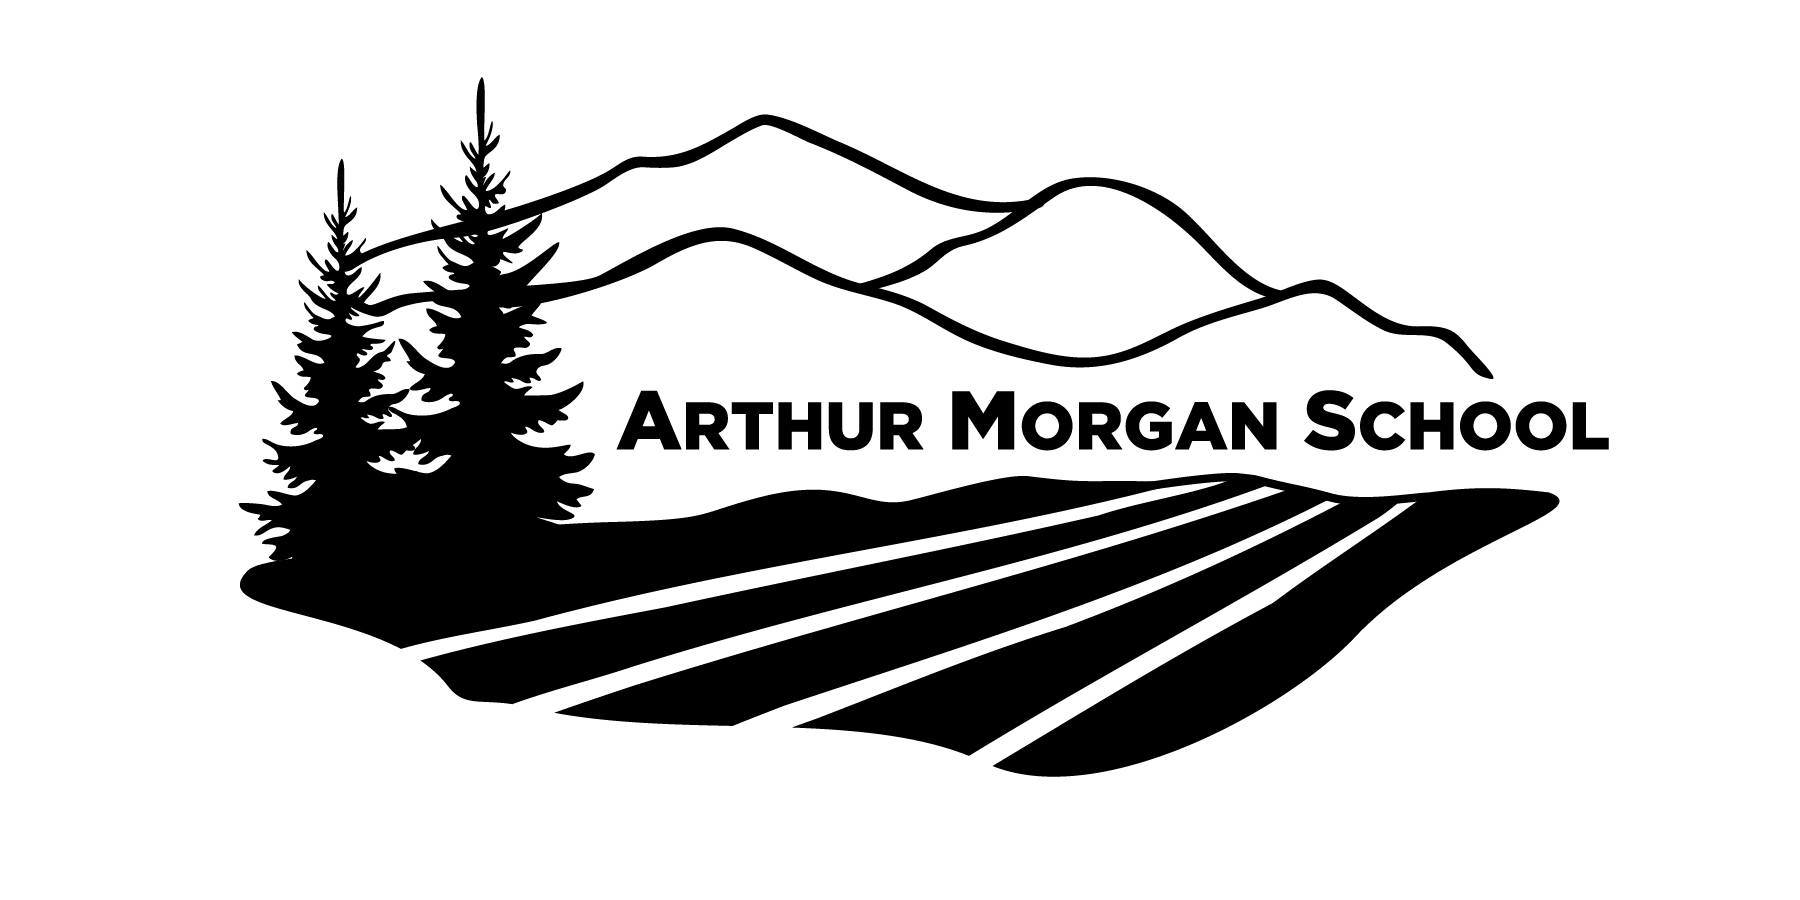 Arthur Morgan School